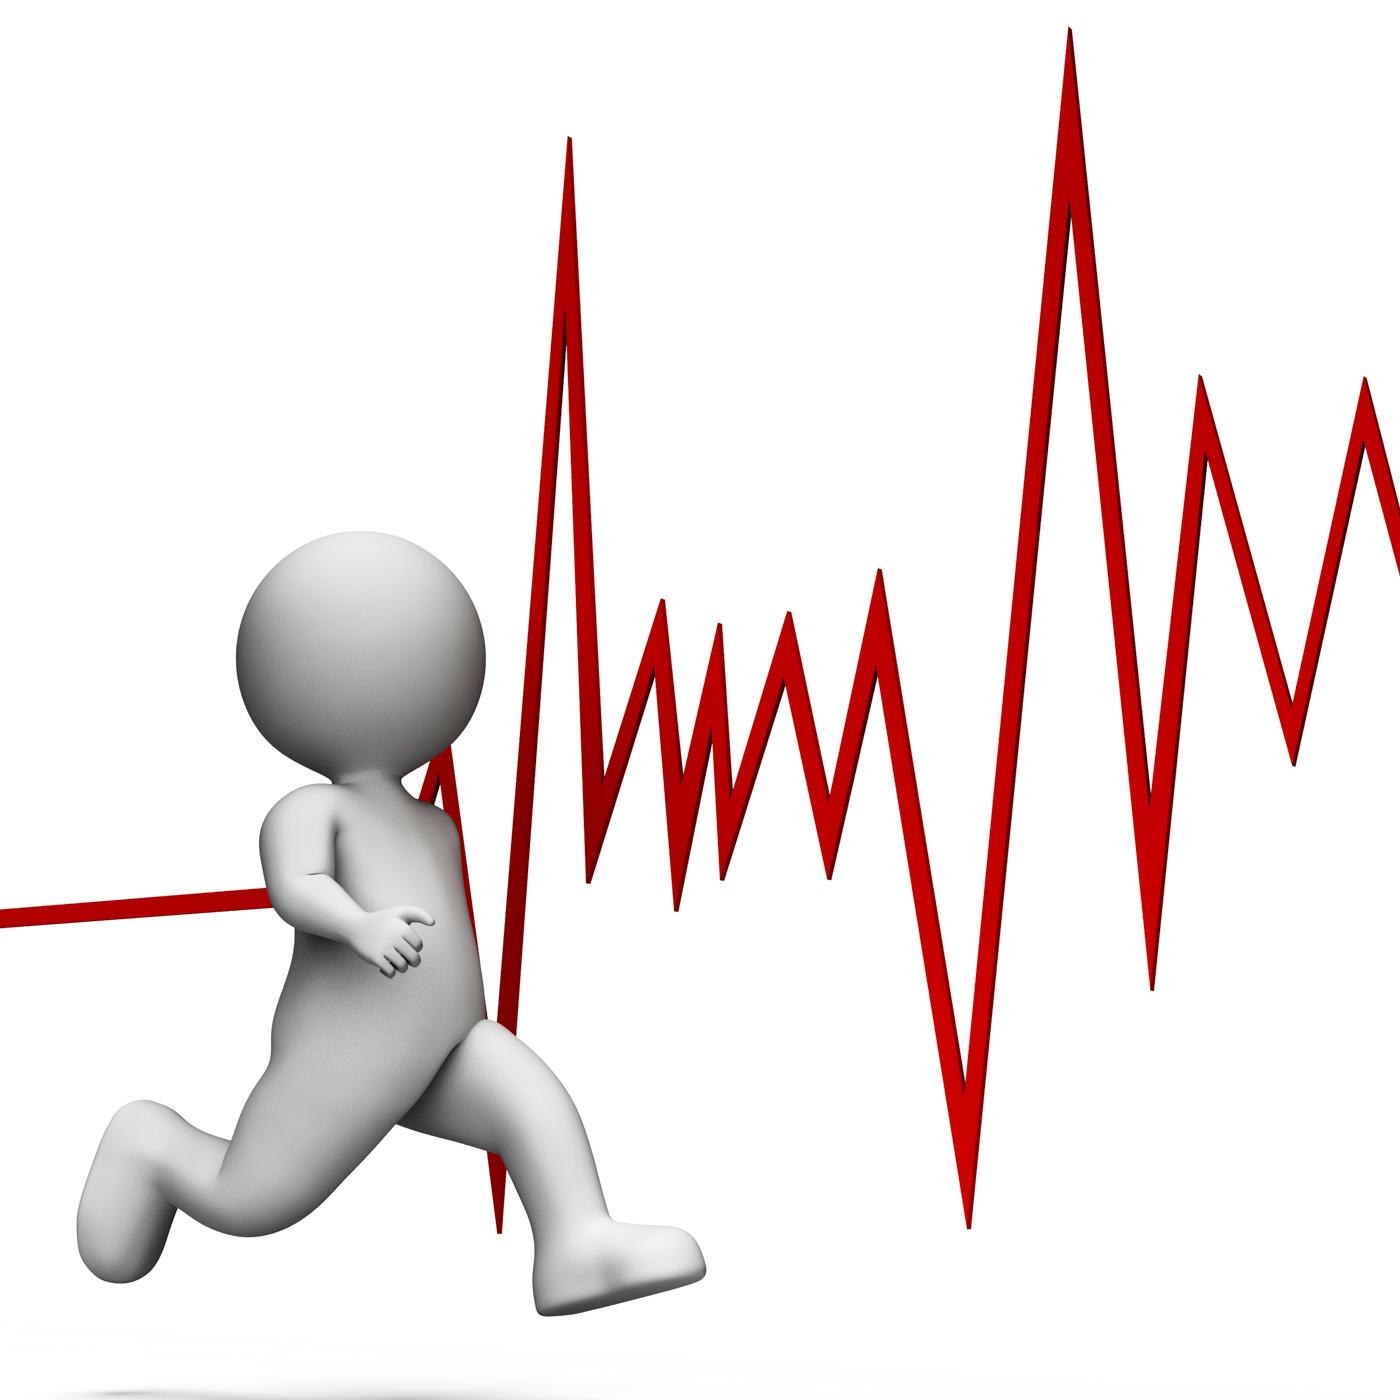 Health Heartbeat Represents Wellness Sprint And Render 3d Rendering, Pulse, Jogging, Man, Medicine, HQ Photo